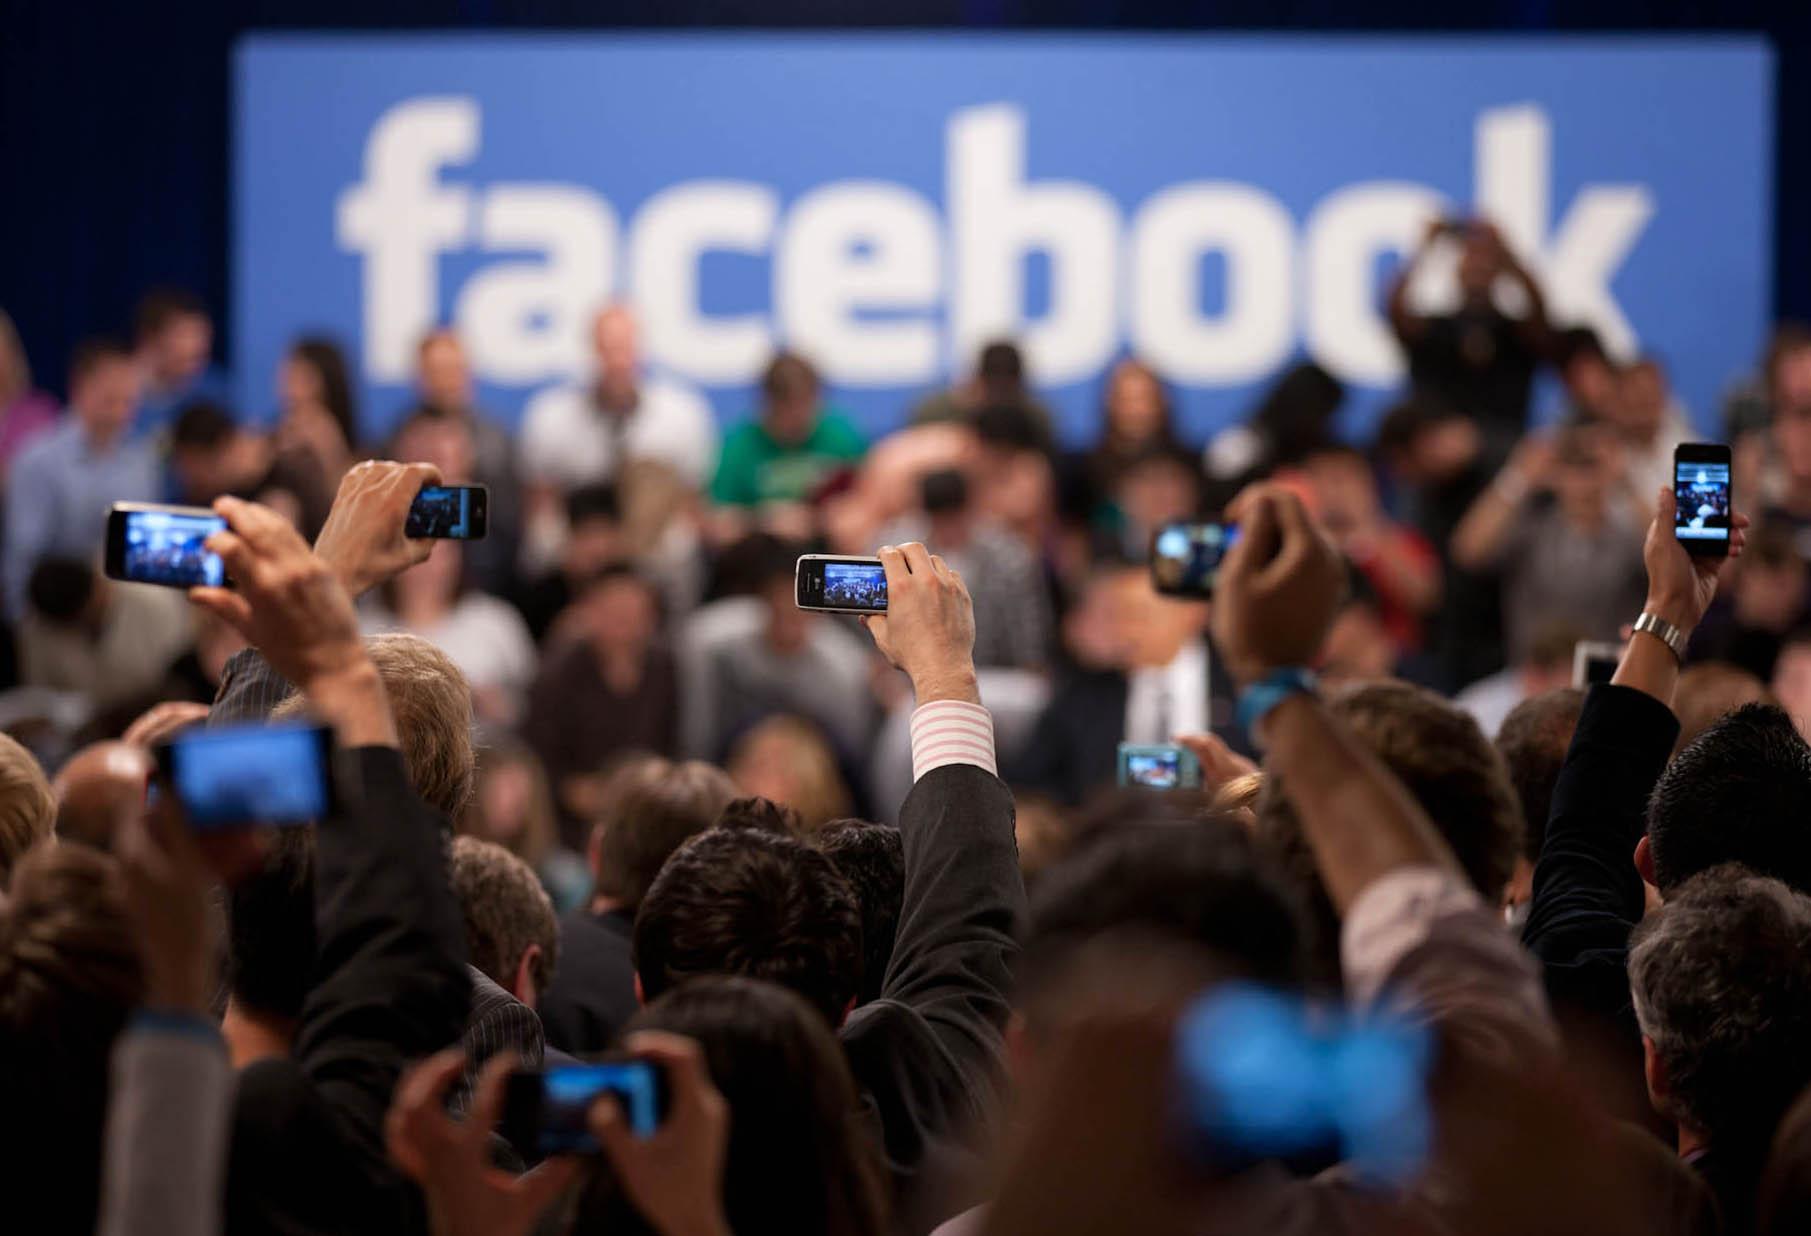 digital tax digital economy single market tech giants european union united states